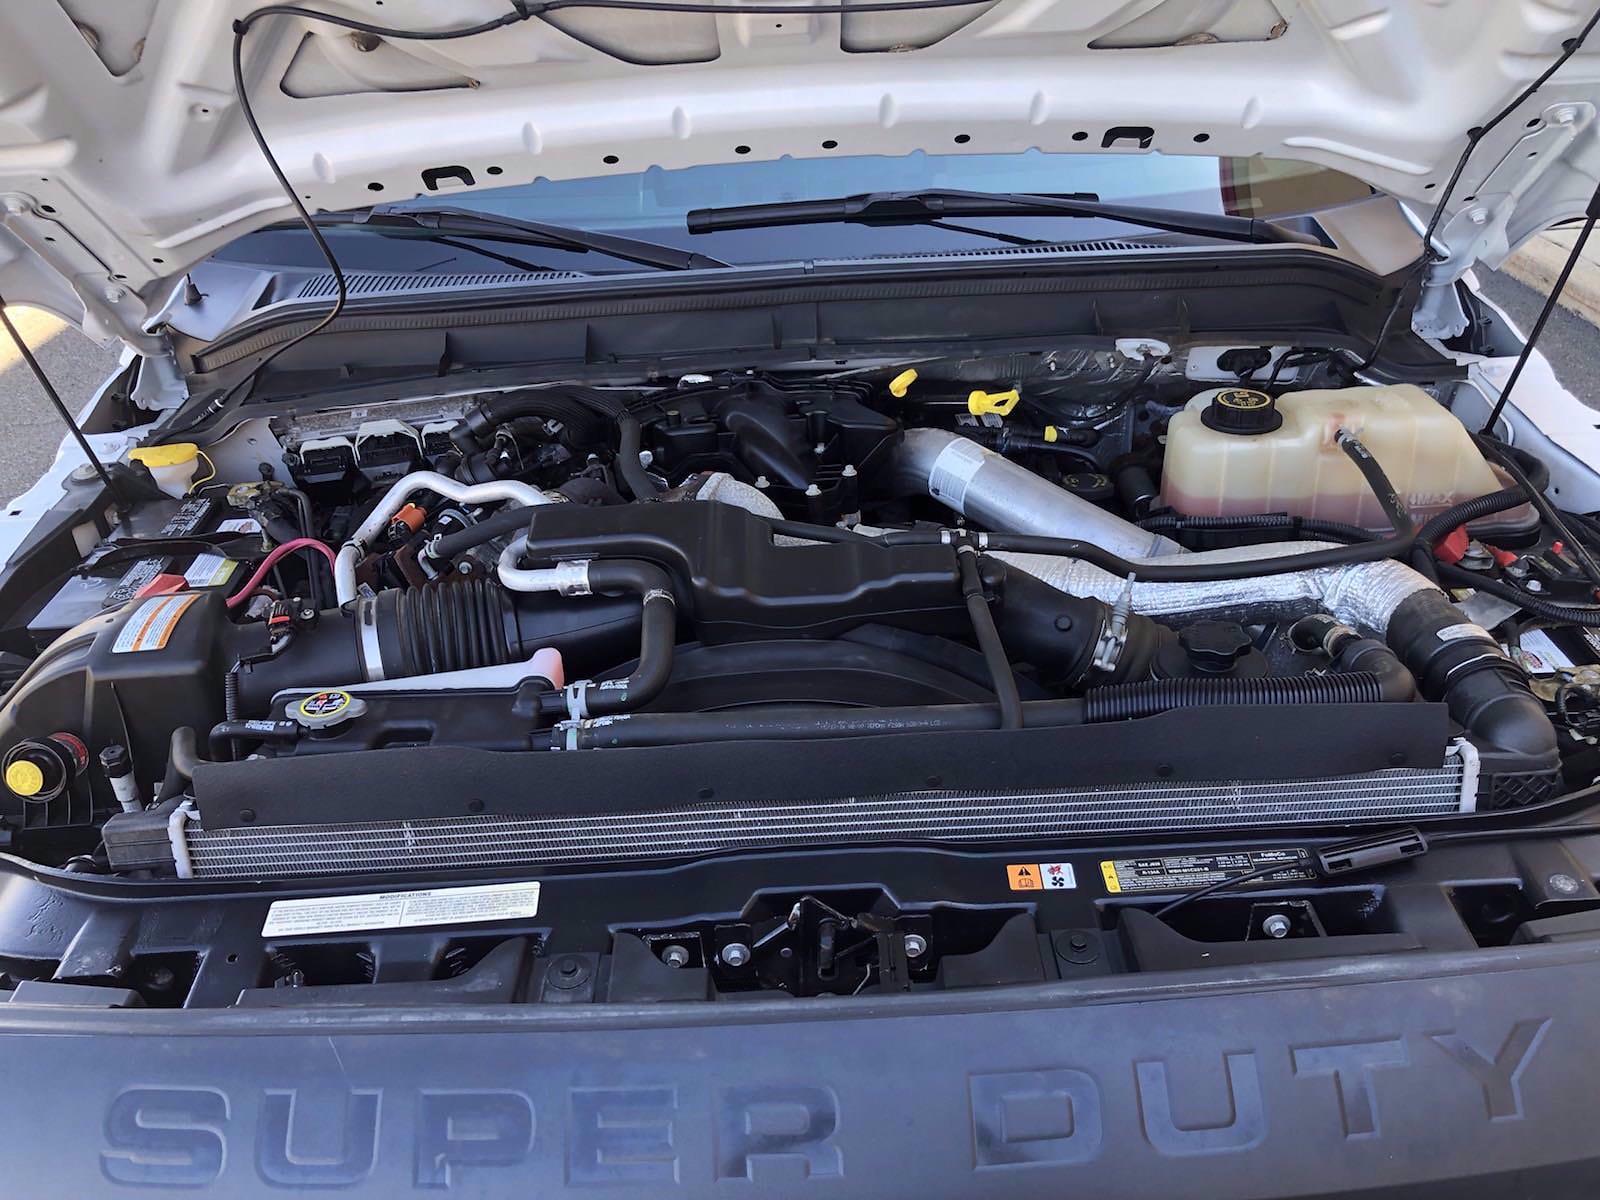 2016 Ford F-550 Regular Cab DRW 4x4, Dump Body #FL1098J - photo 17